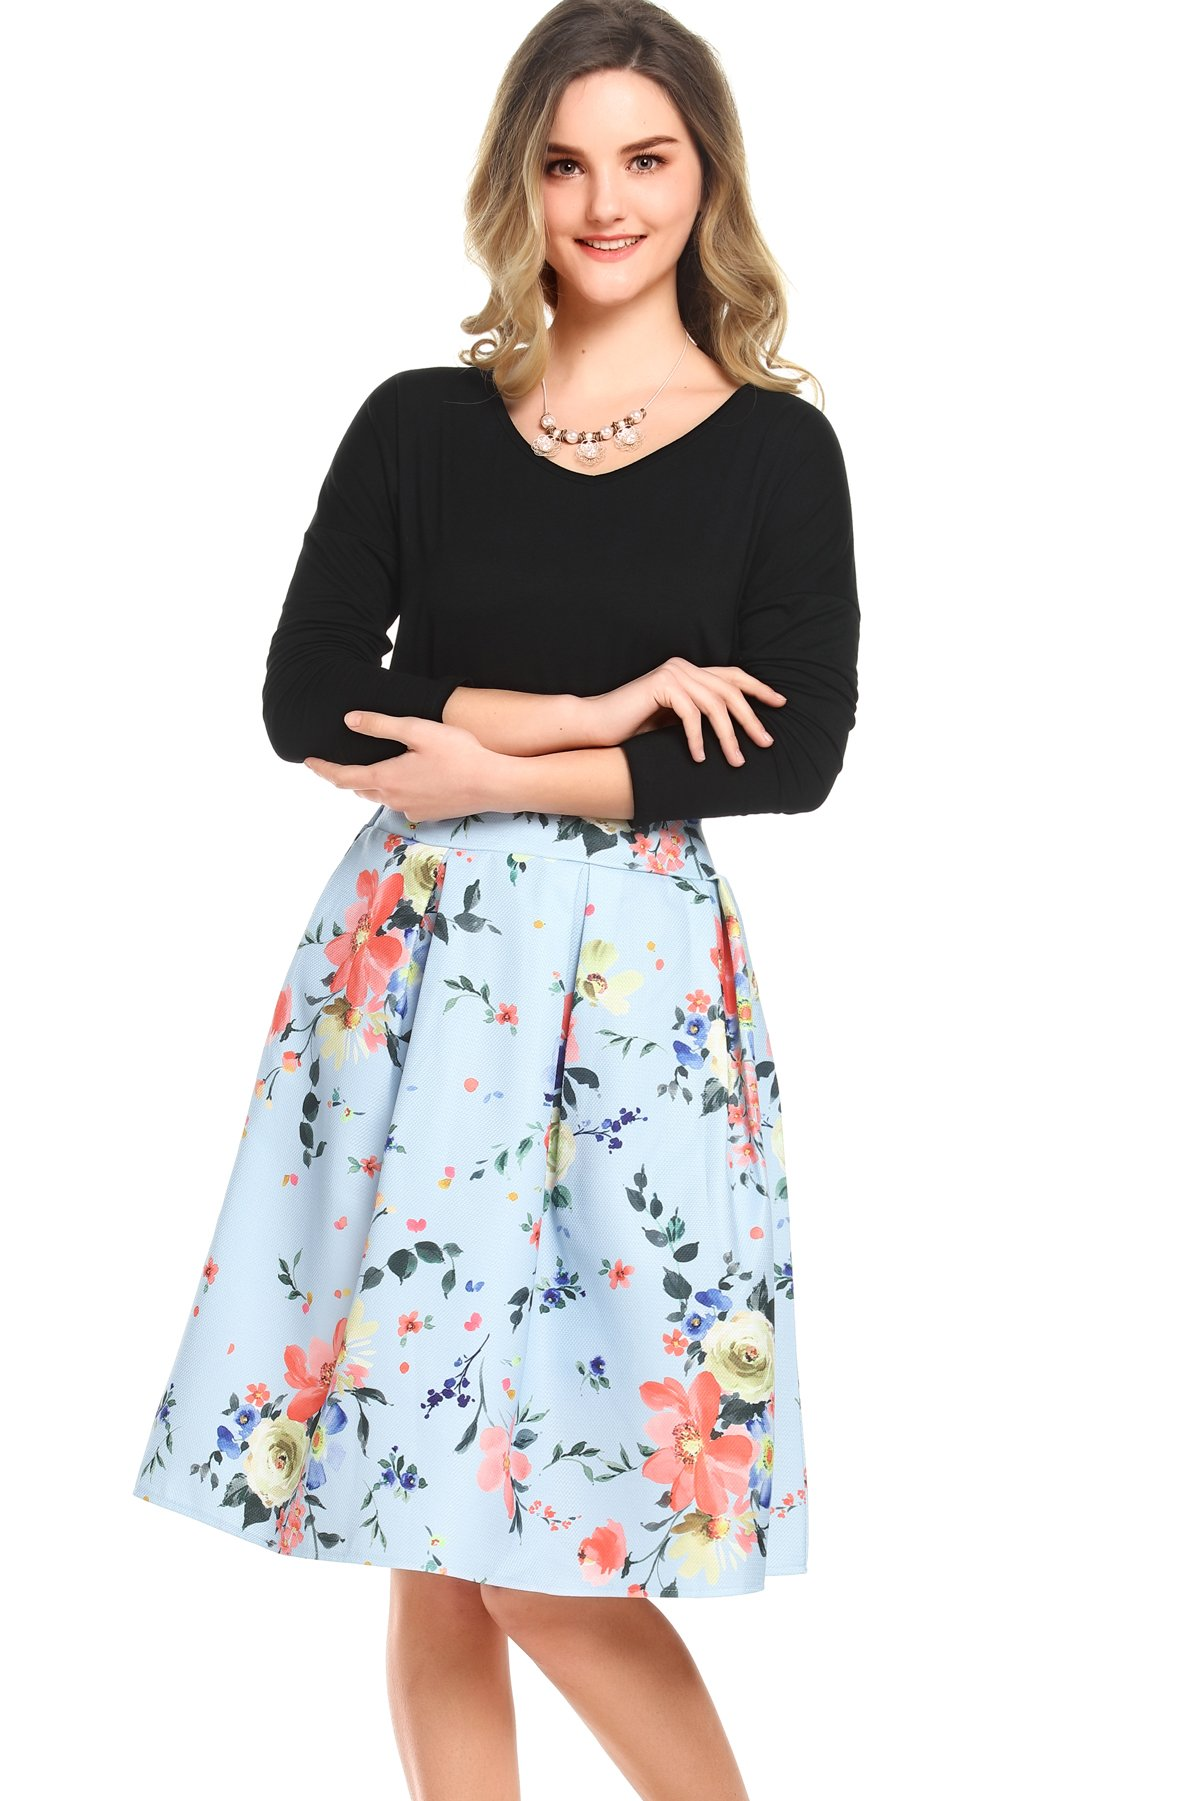 Beluring Womens Floral Print Swing Skirt Pleated Midi Swing Skirts 2018